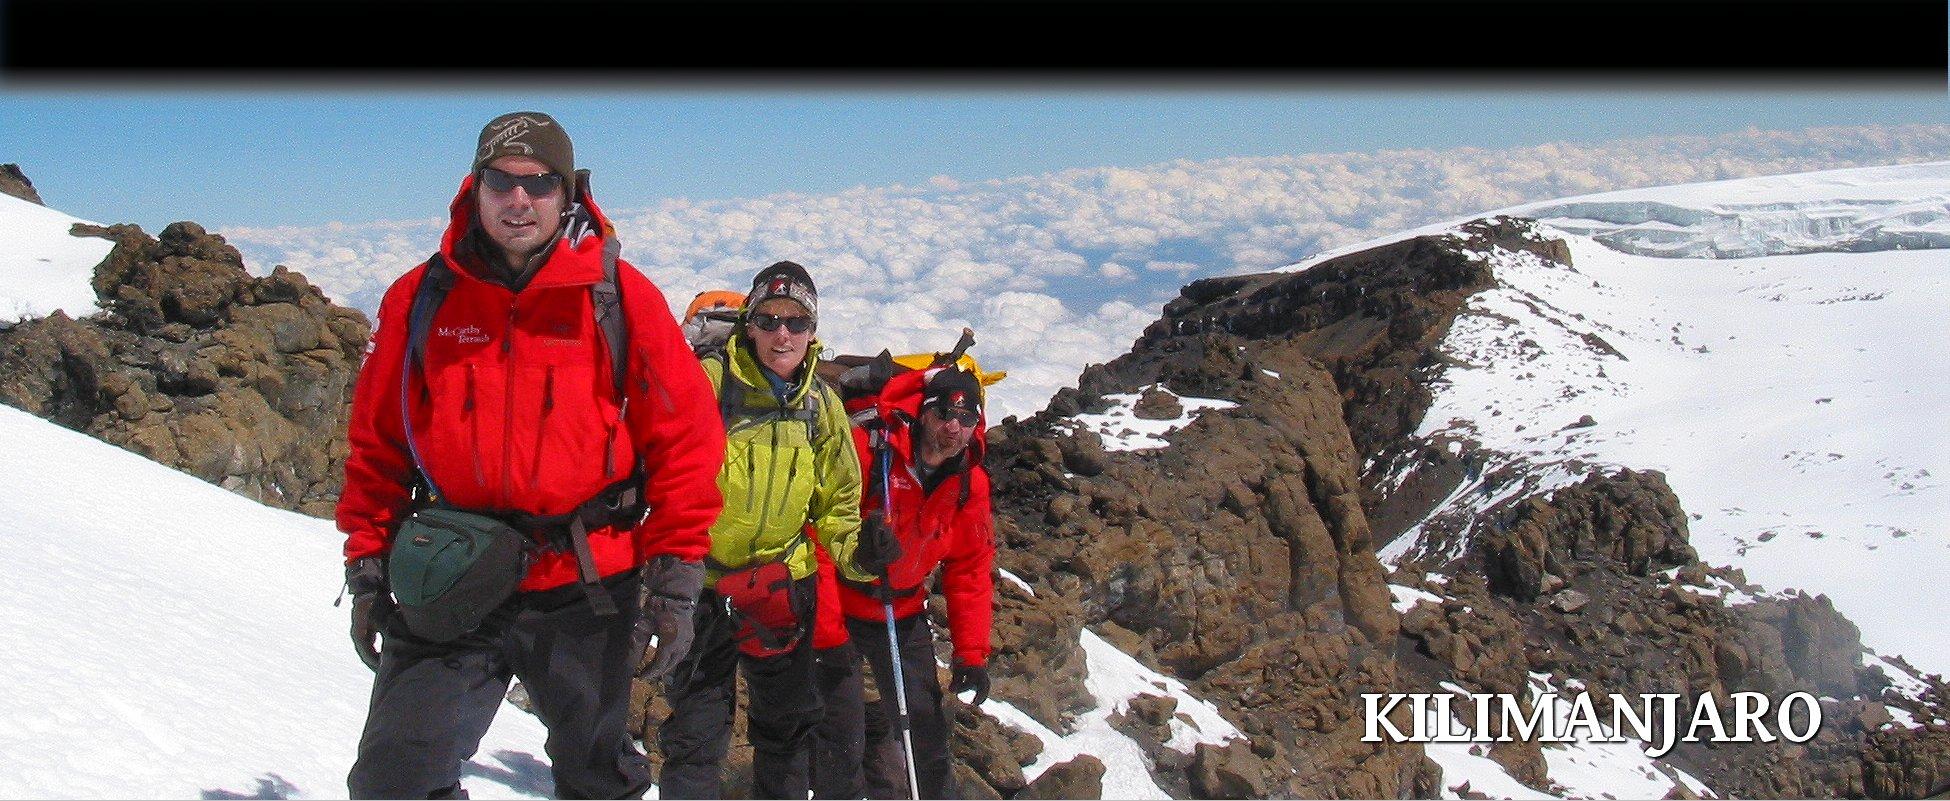 Tusker - Kilimanjaro Lemosho